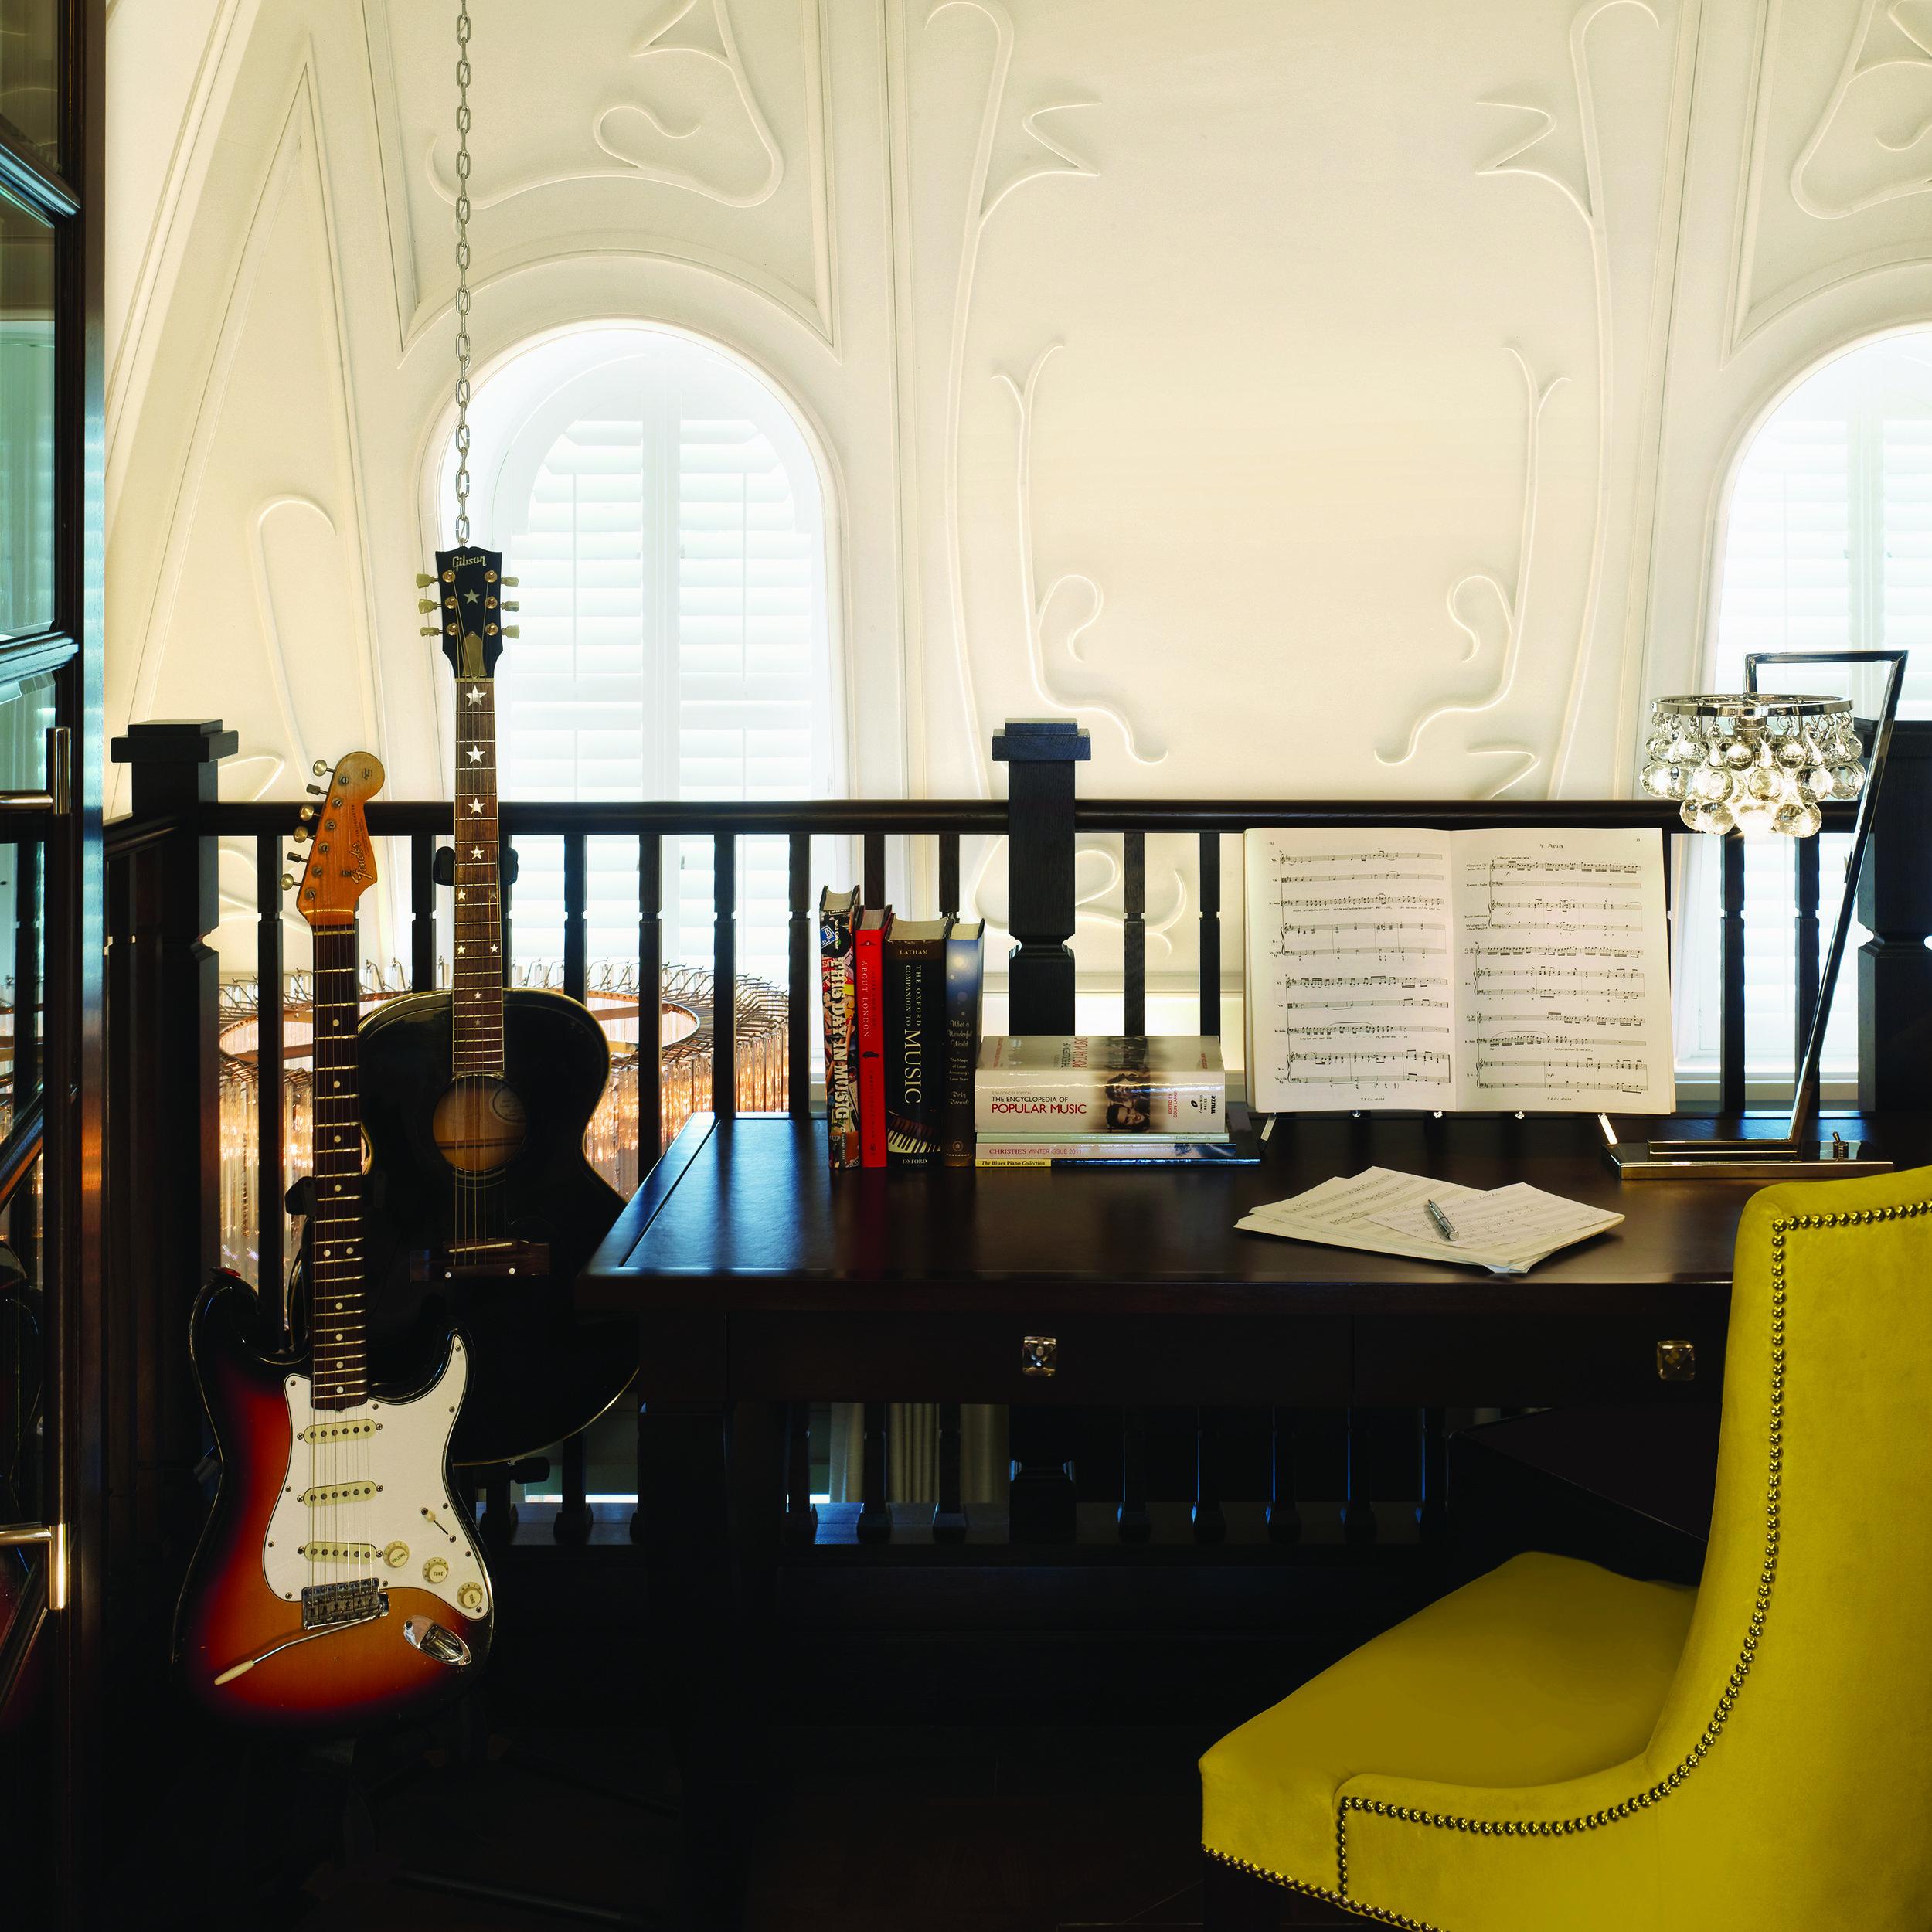 Musicians Penthouse Gallery Corinthia Hotel London.jpg